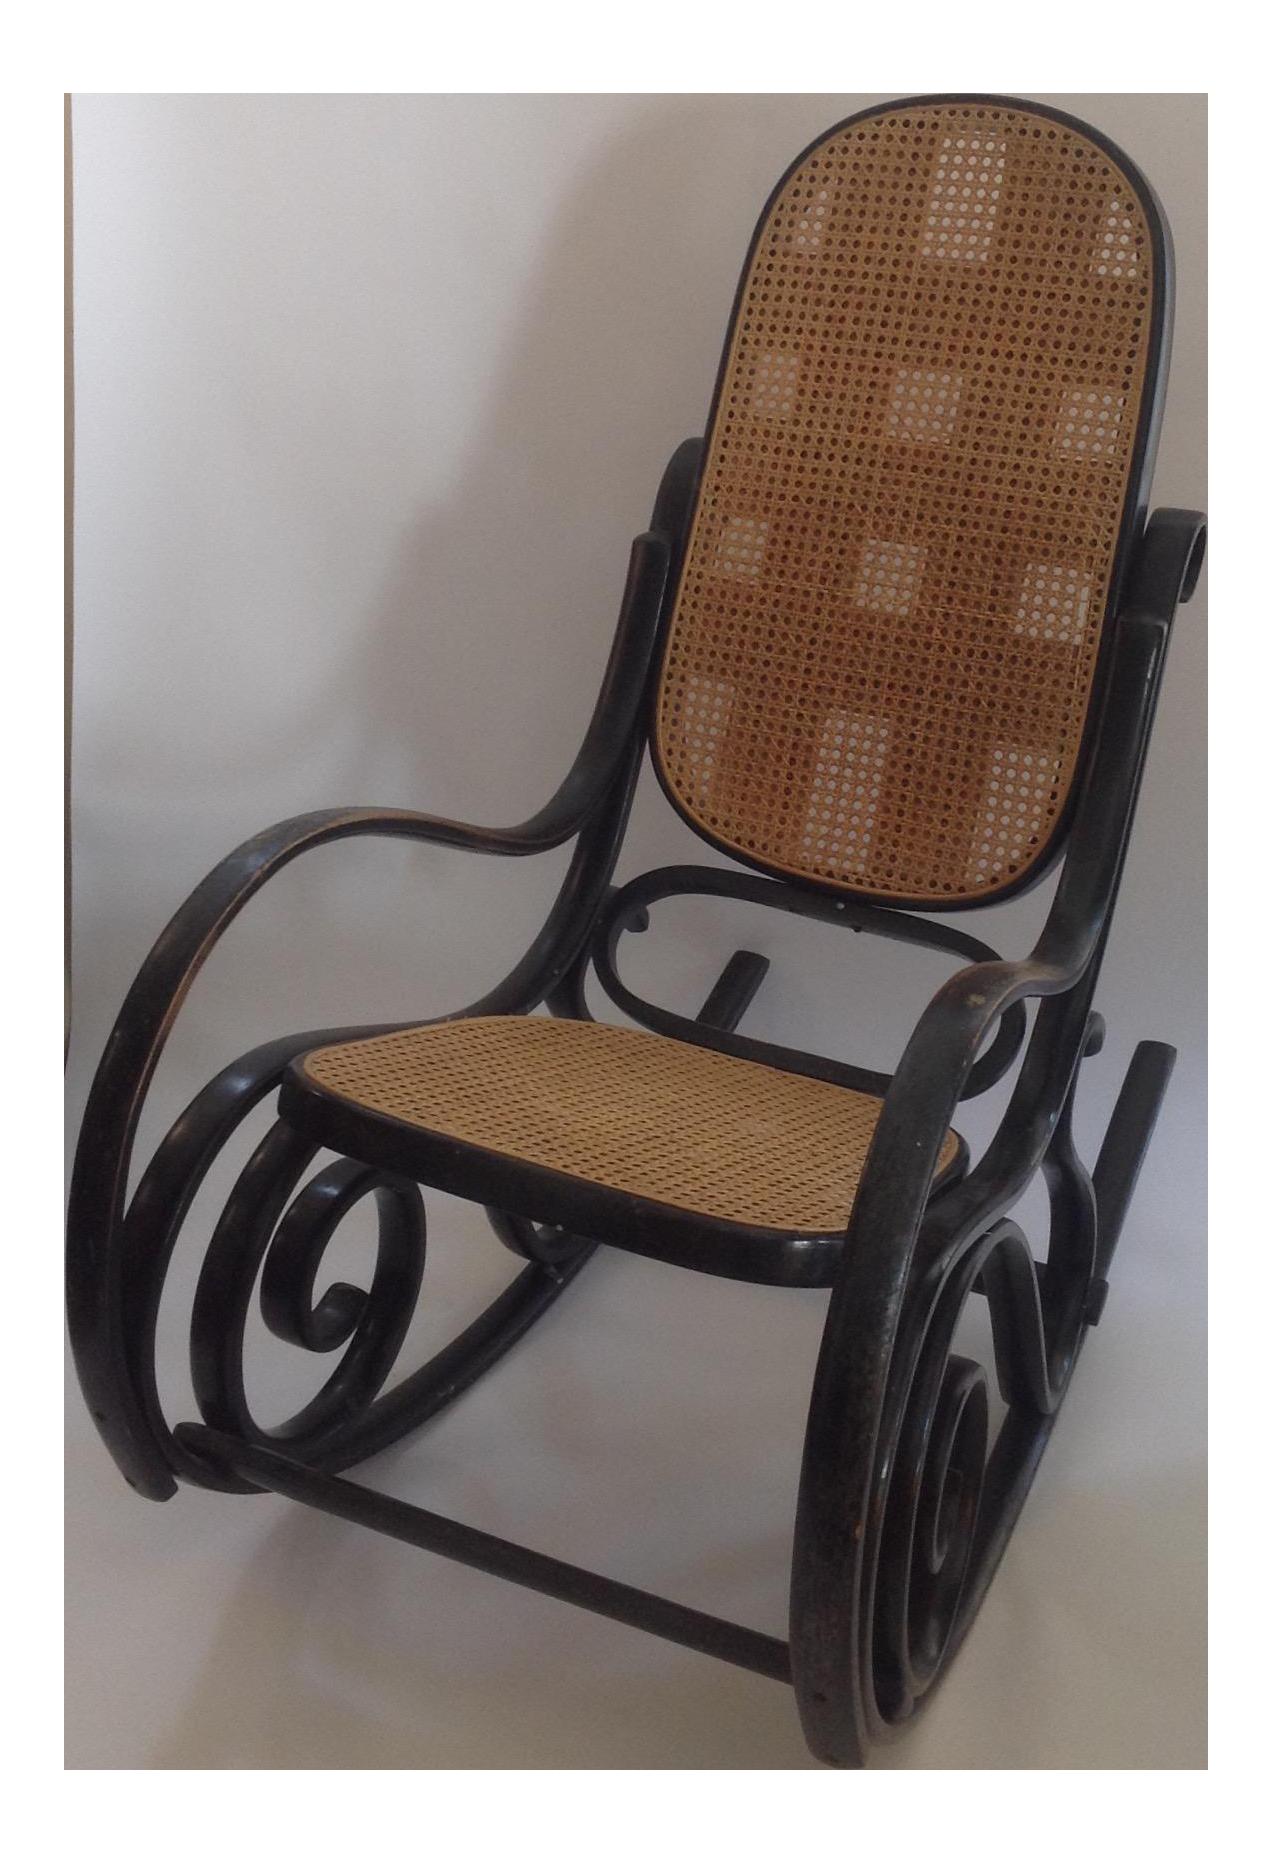 Black Cane Bent Wood Rocking Chair